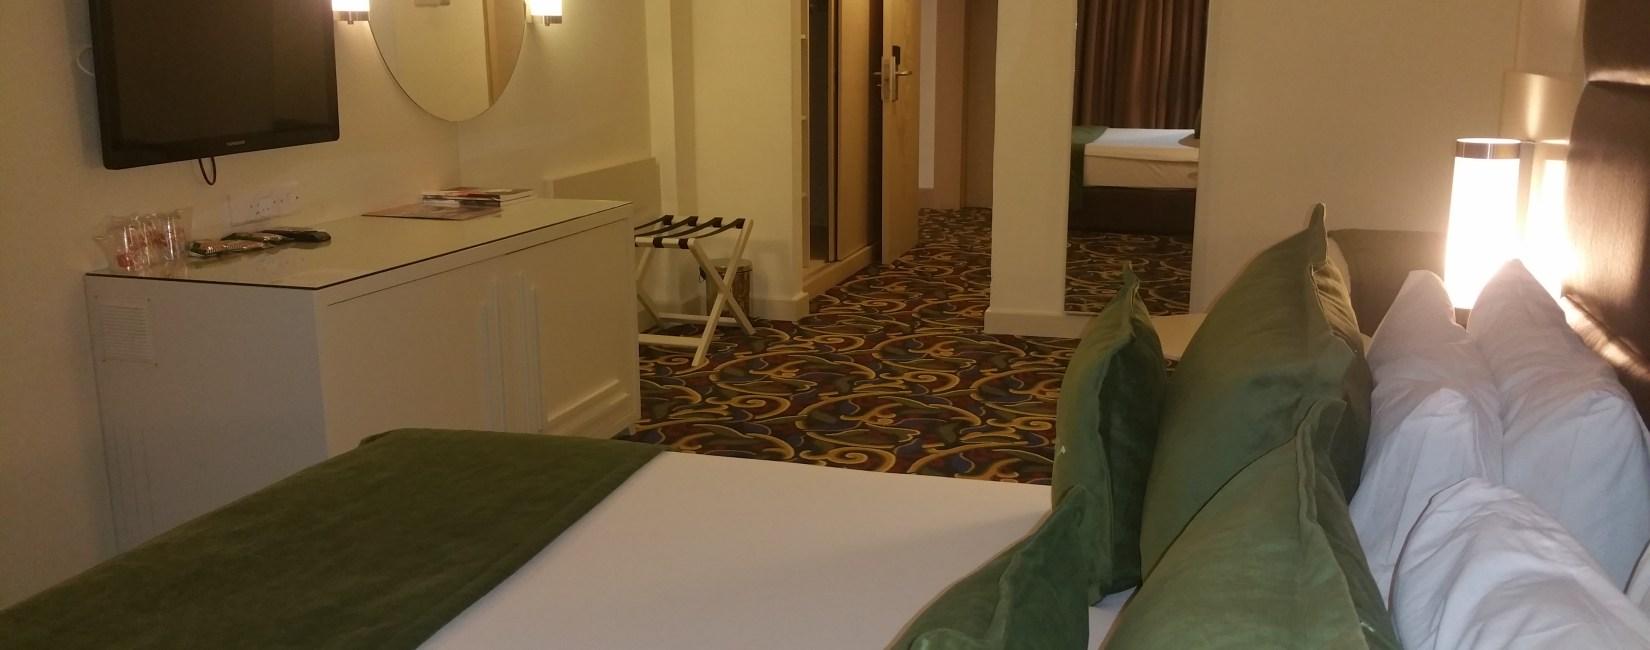 Hotel Sea View Room